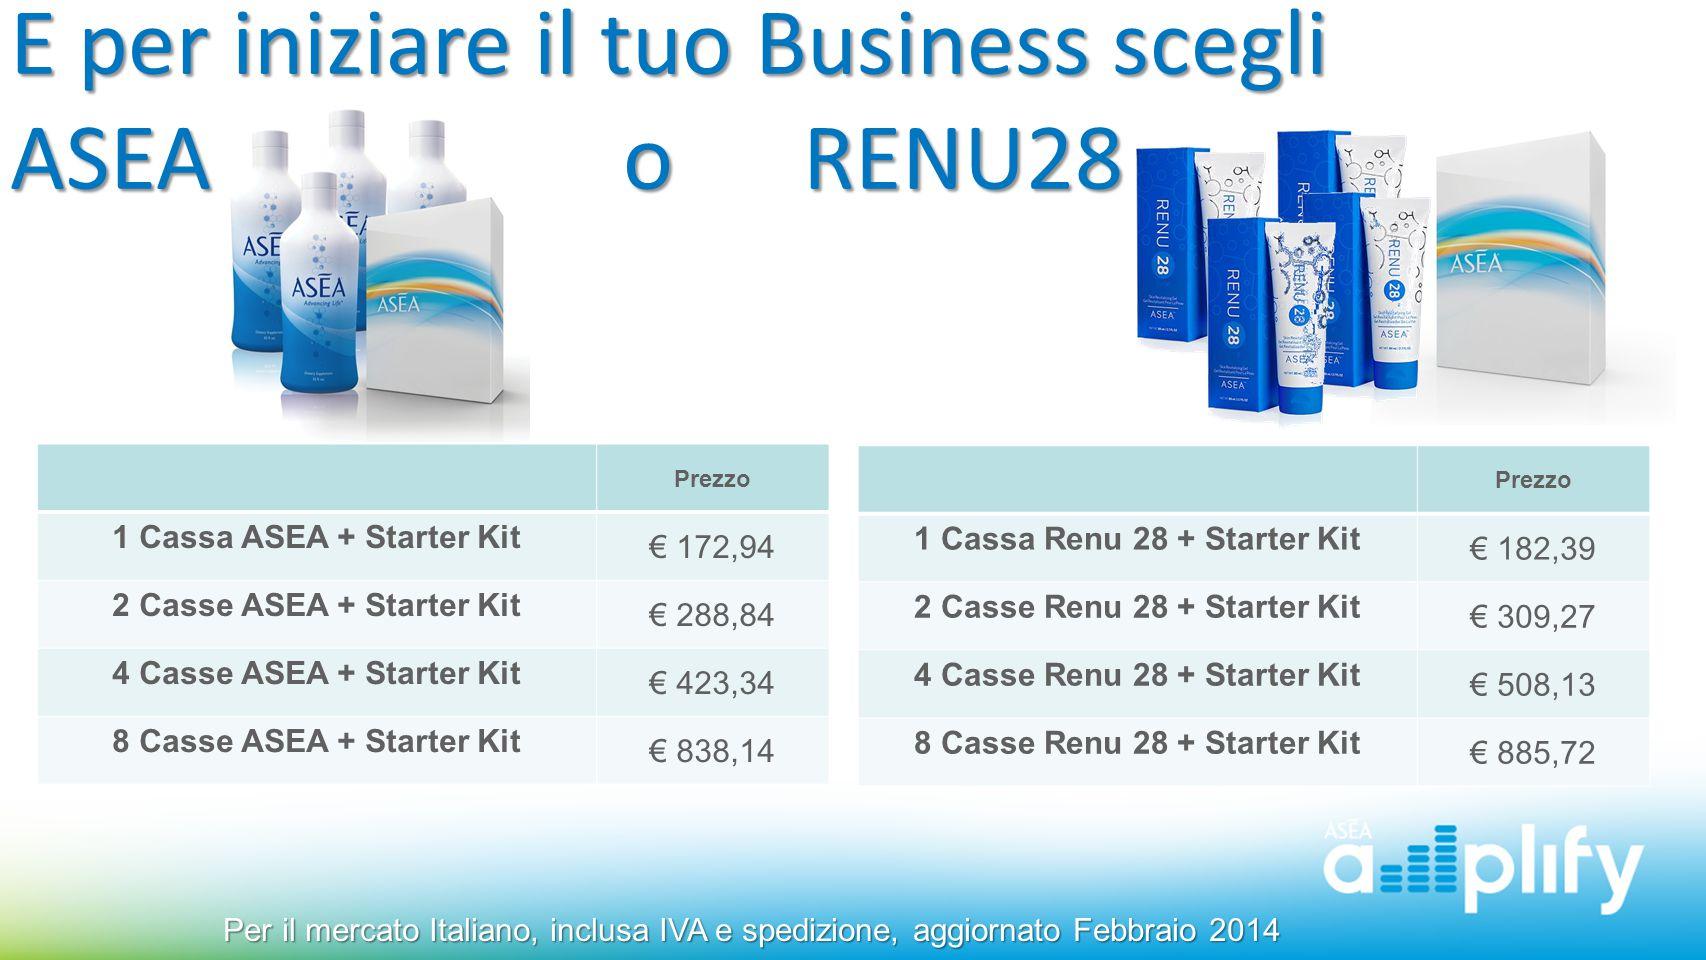 Prezzo 1 Cassa Renu 28 + Starter Kit € 182,39 2 Casse Renu 28 + Starter Kit € 309,27 4 Casse Renu 28 + Starter Kit € 508,13 8 Casse Renu 28 + Starter